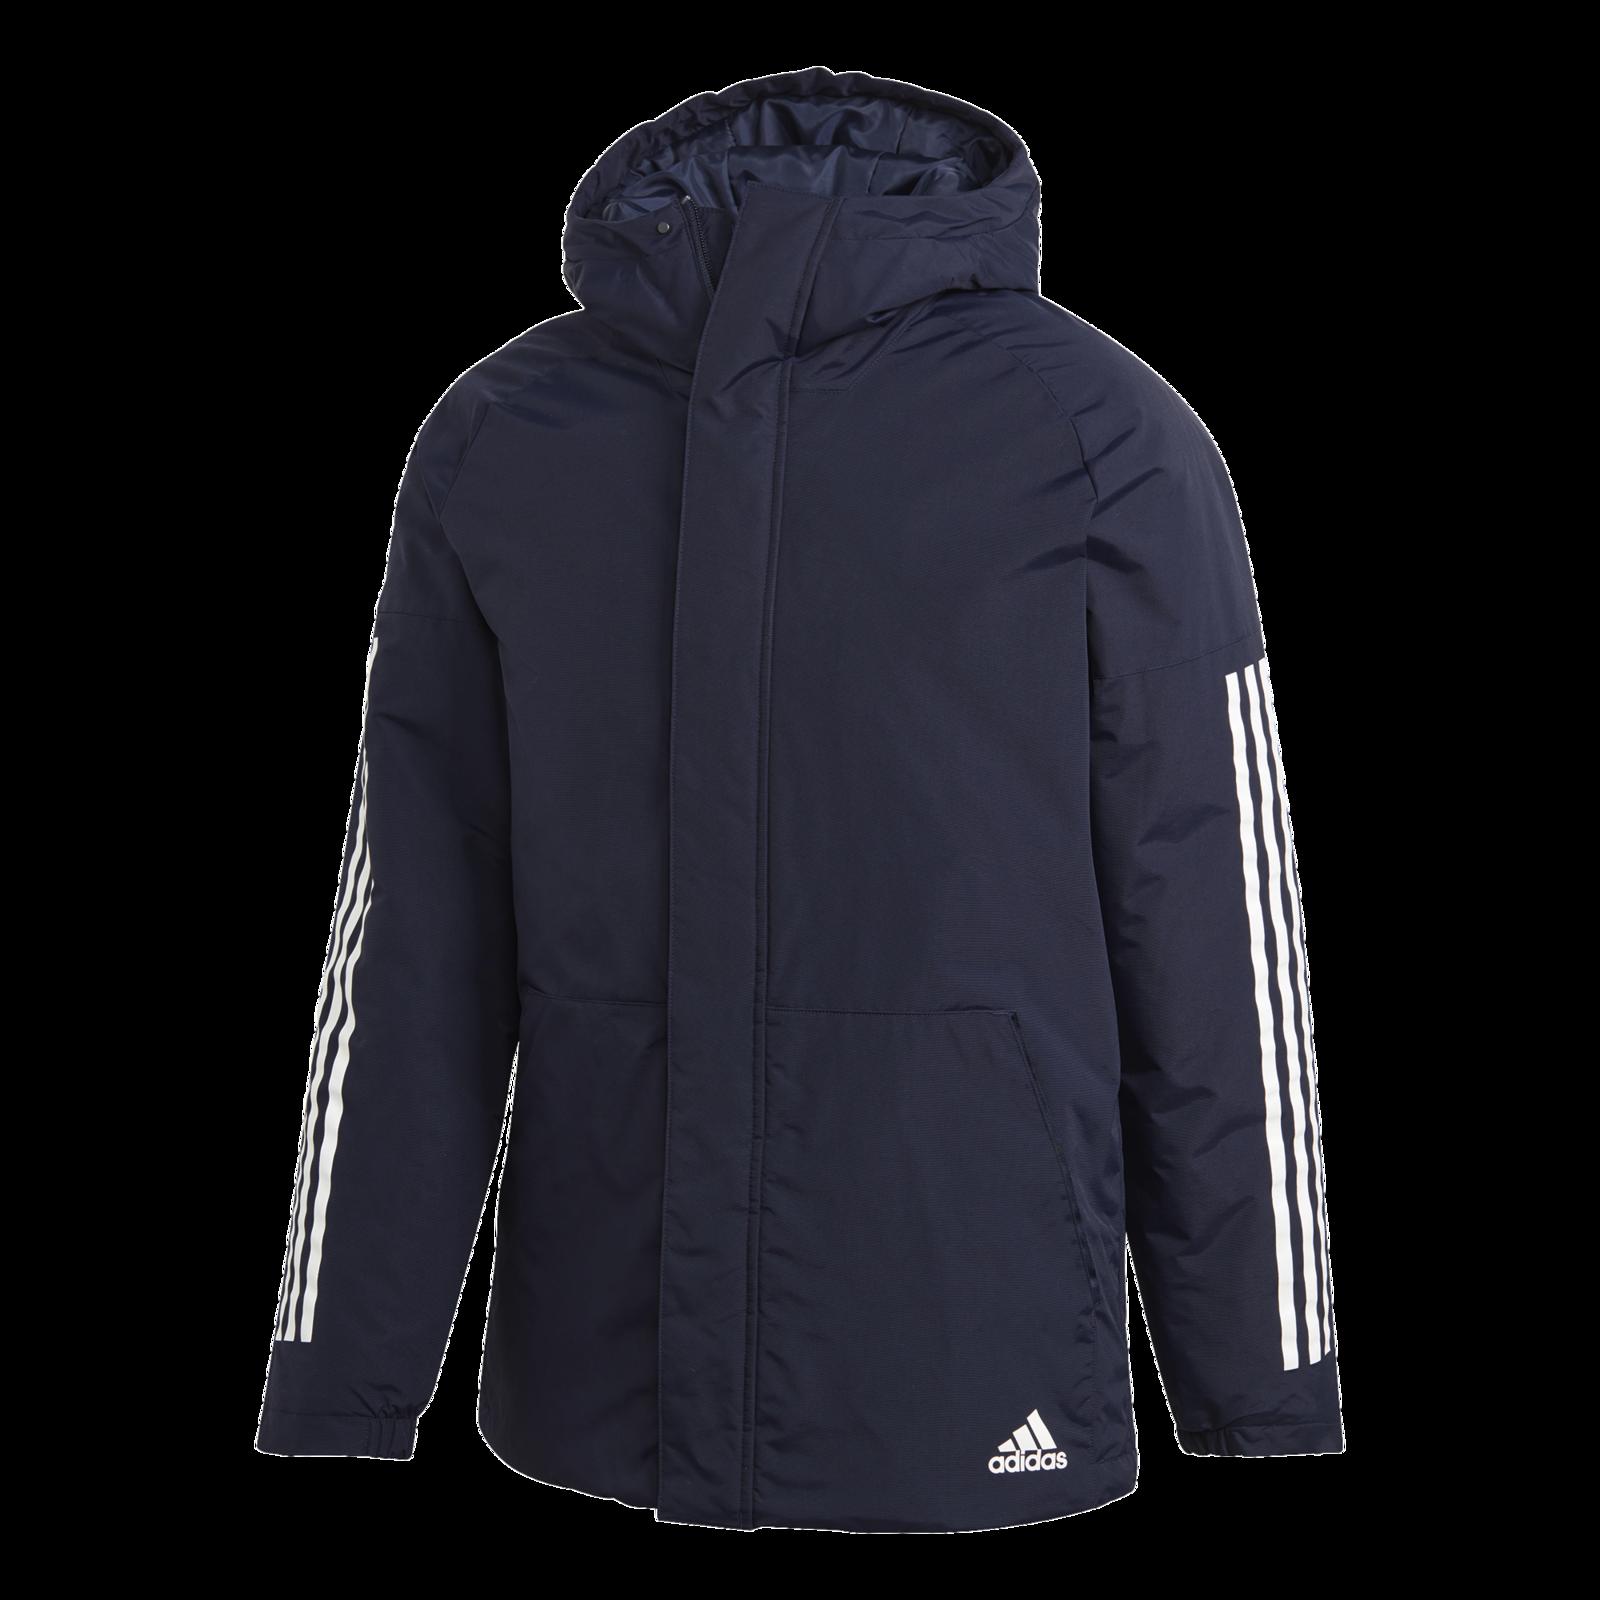 Adidas Xploric 3s Heren